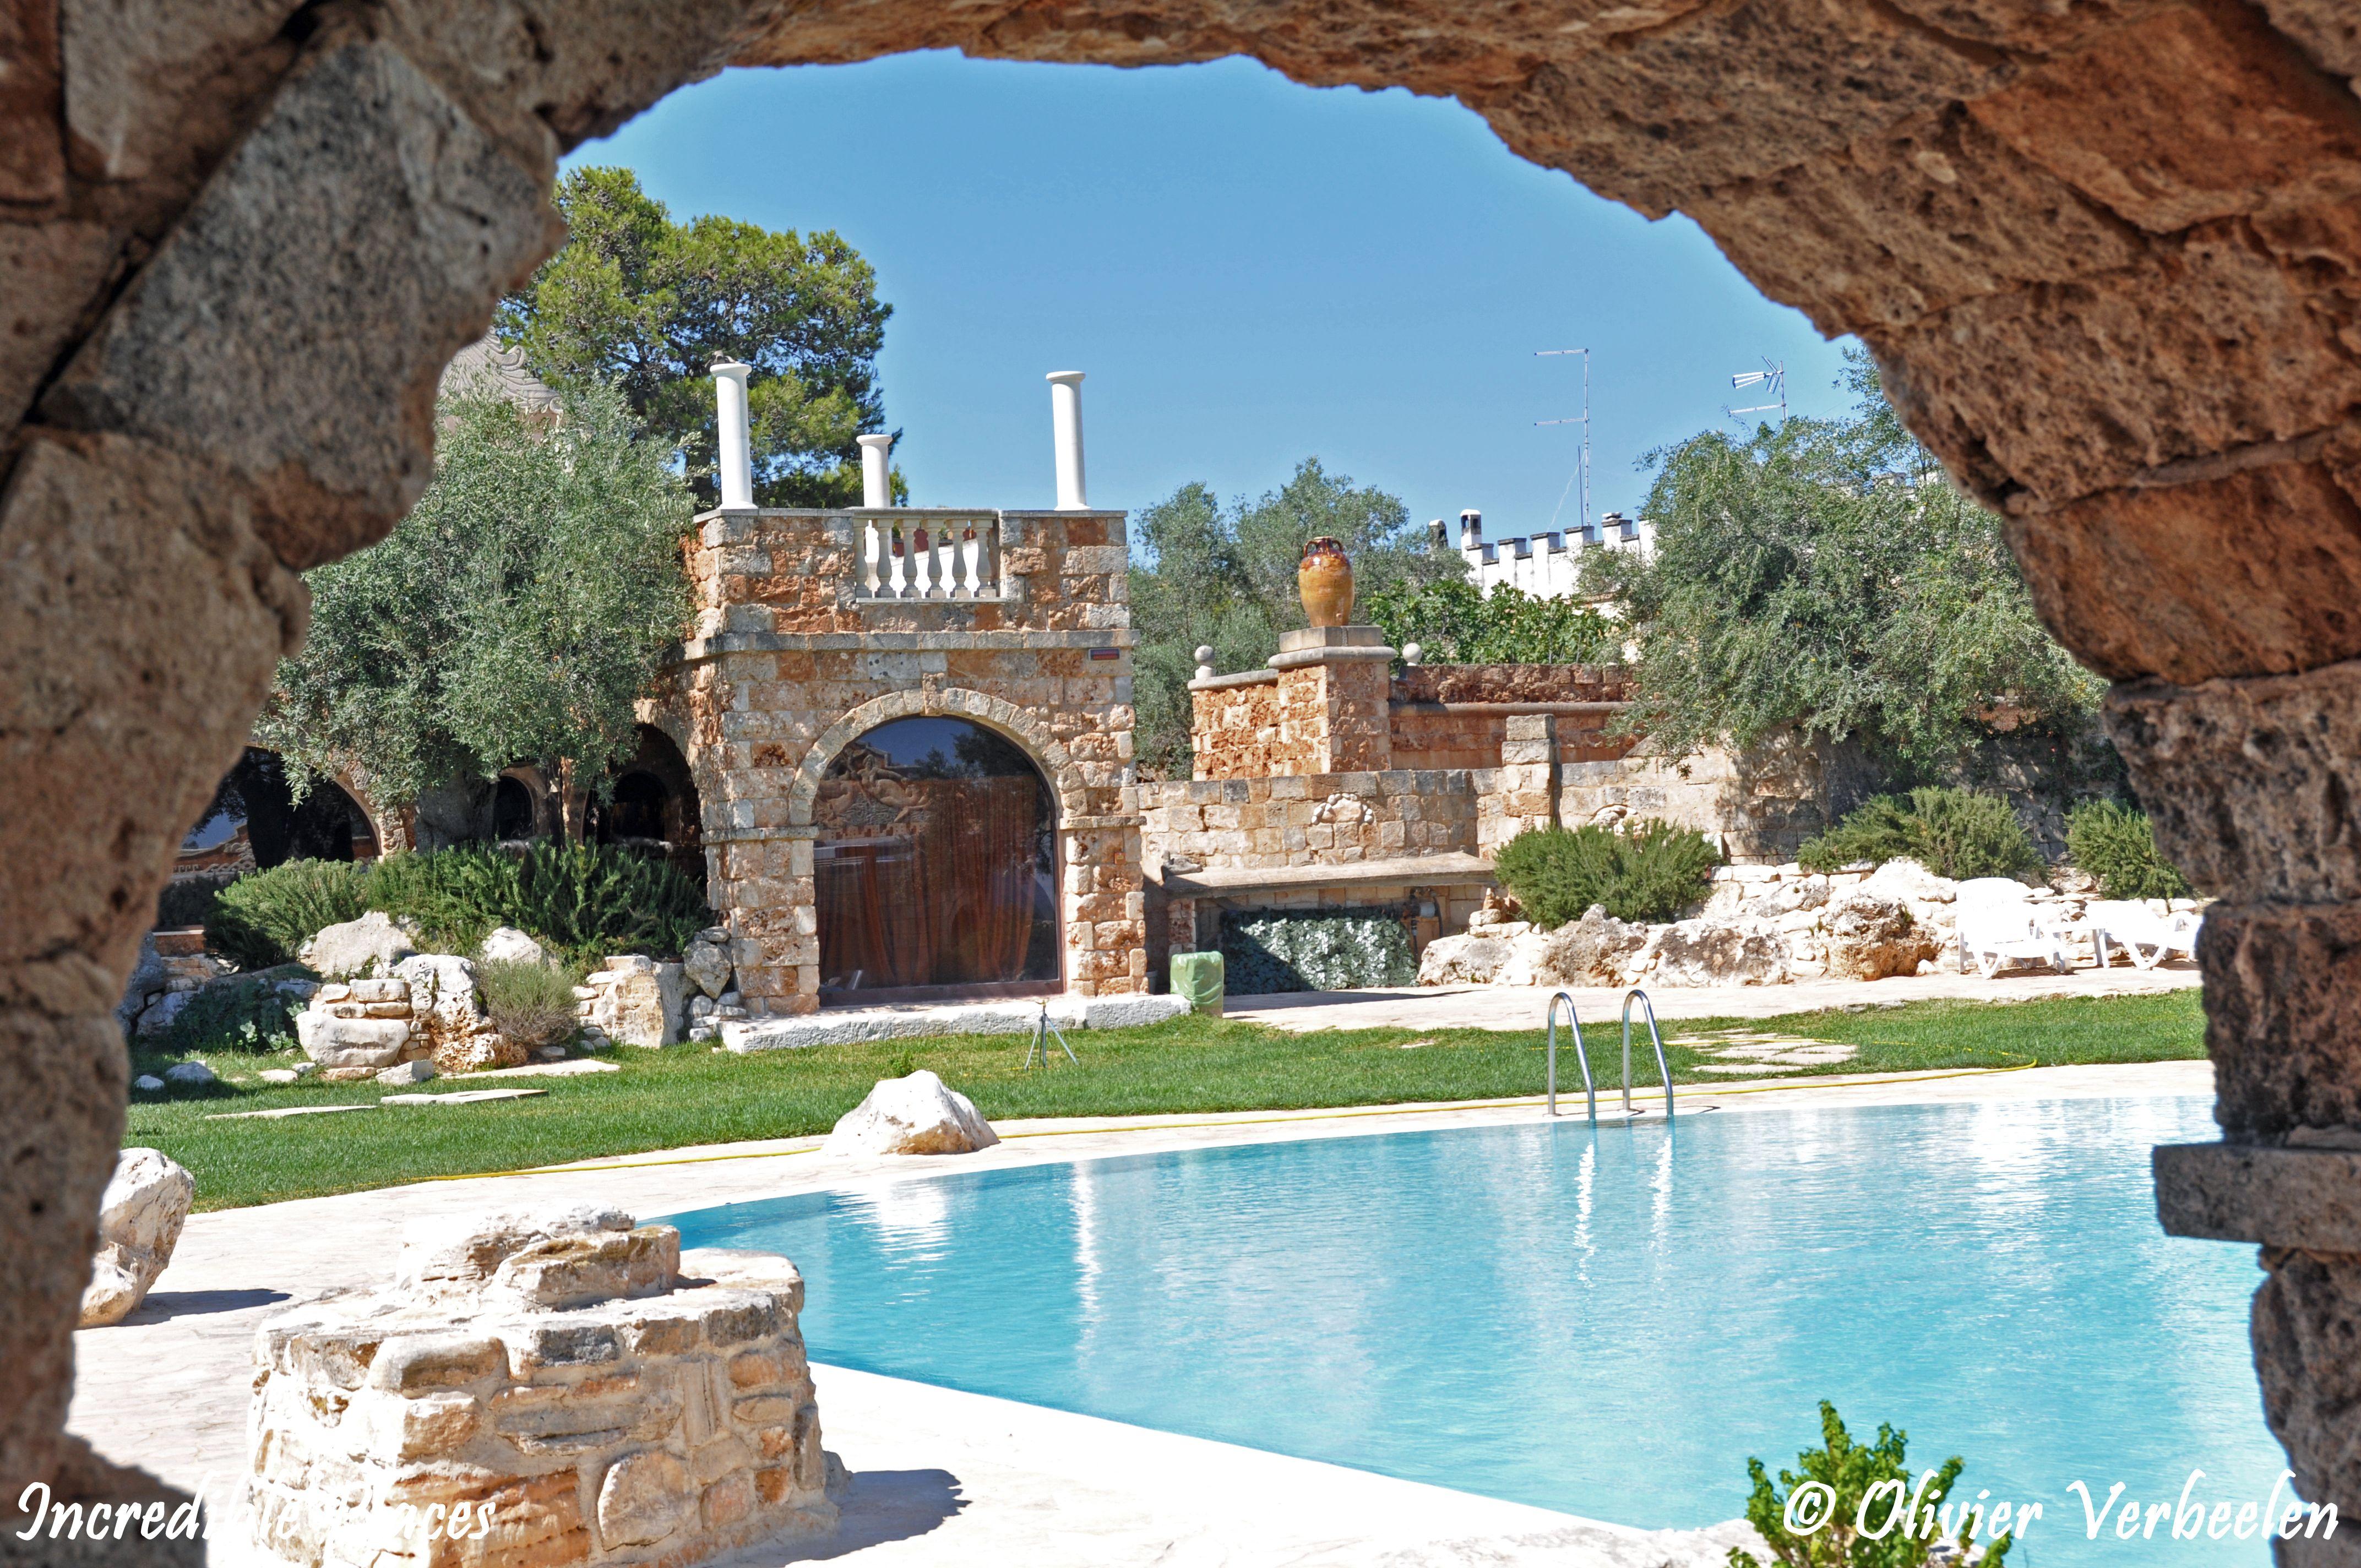 Incredible Places Special Tenute Al Bano Carrisi Apulia July